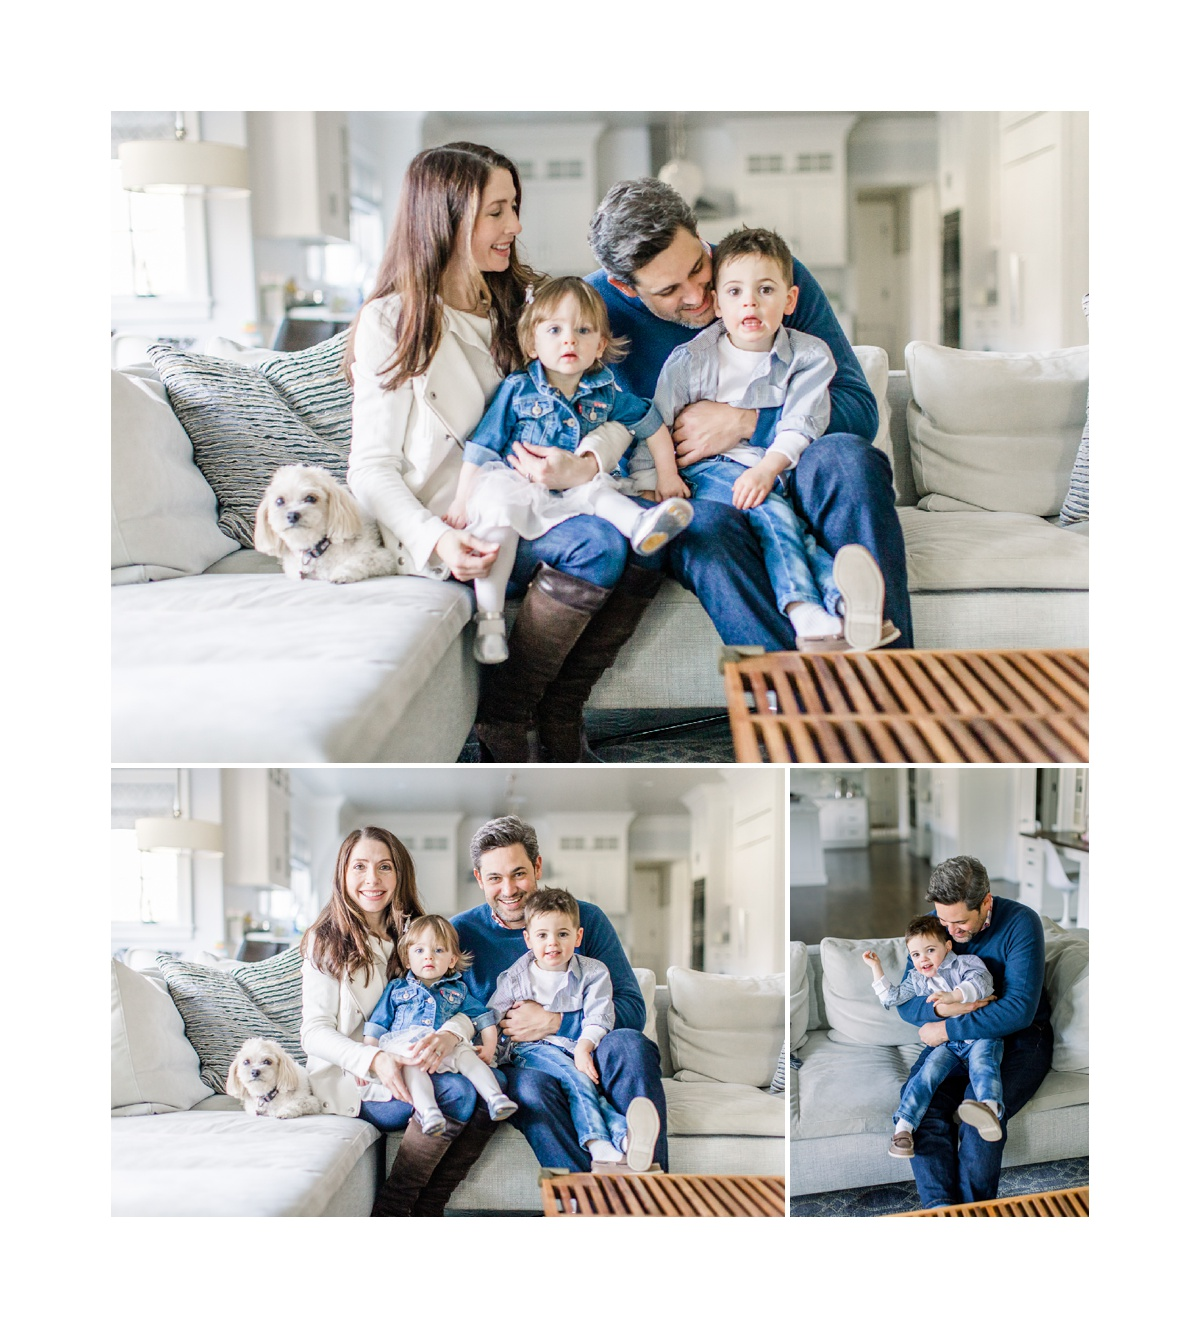 connecticutfamilyphotographerinhomesession.jpg